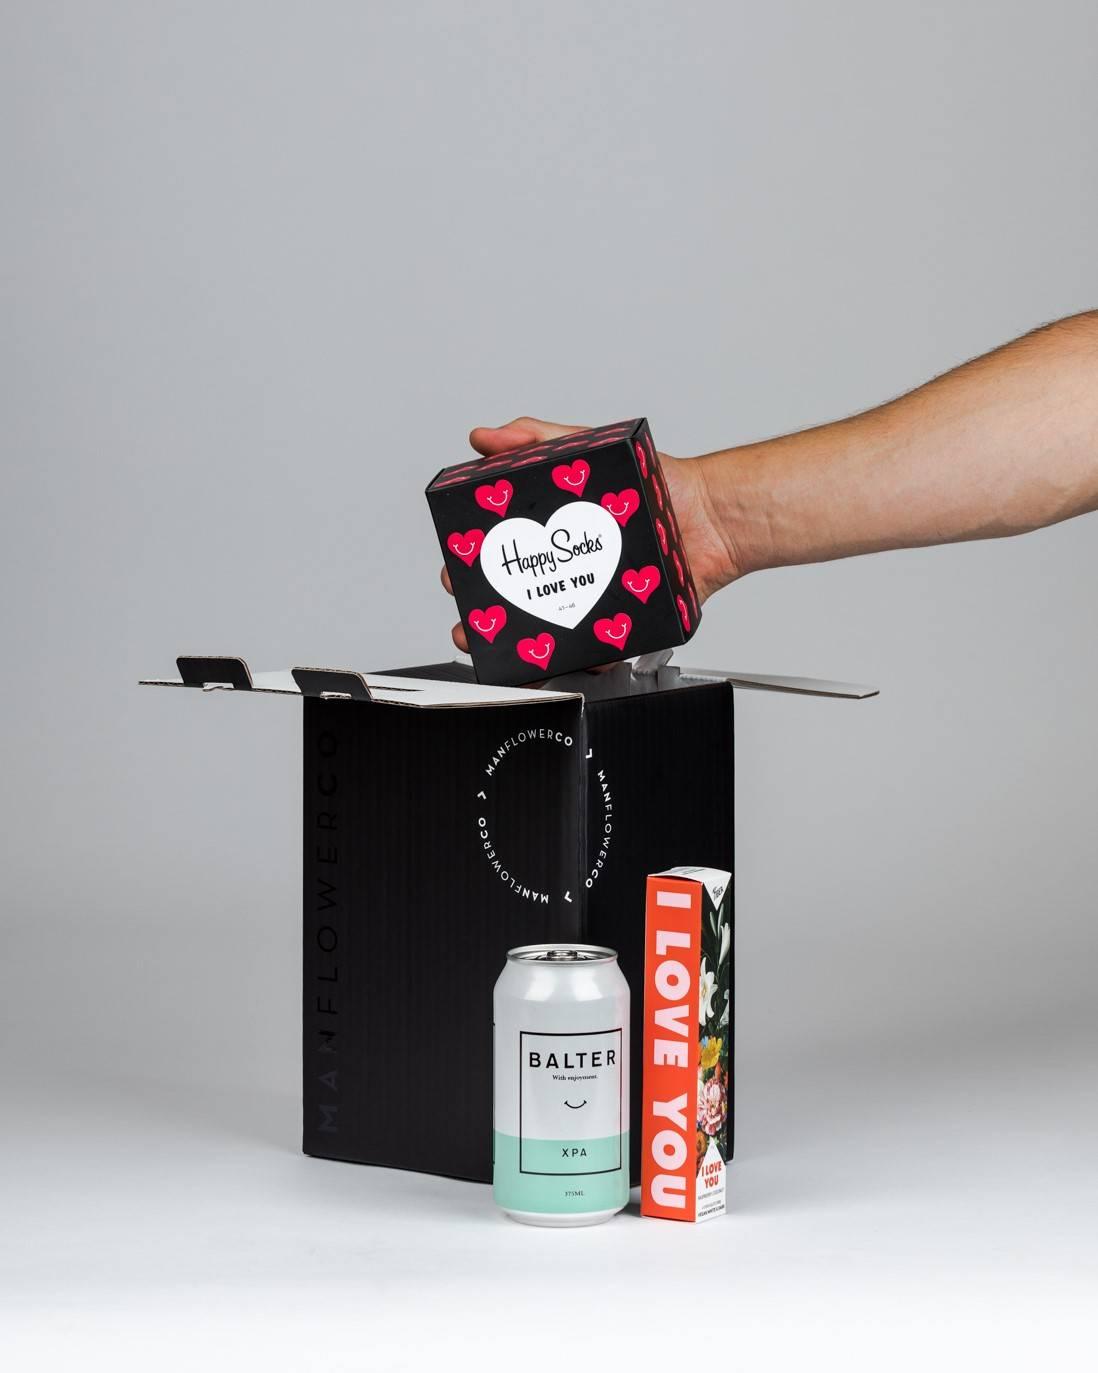 V-Day Happy Socks, part of Manflower Co's range of Valentine's Day Gifts.